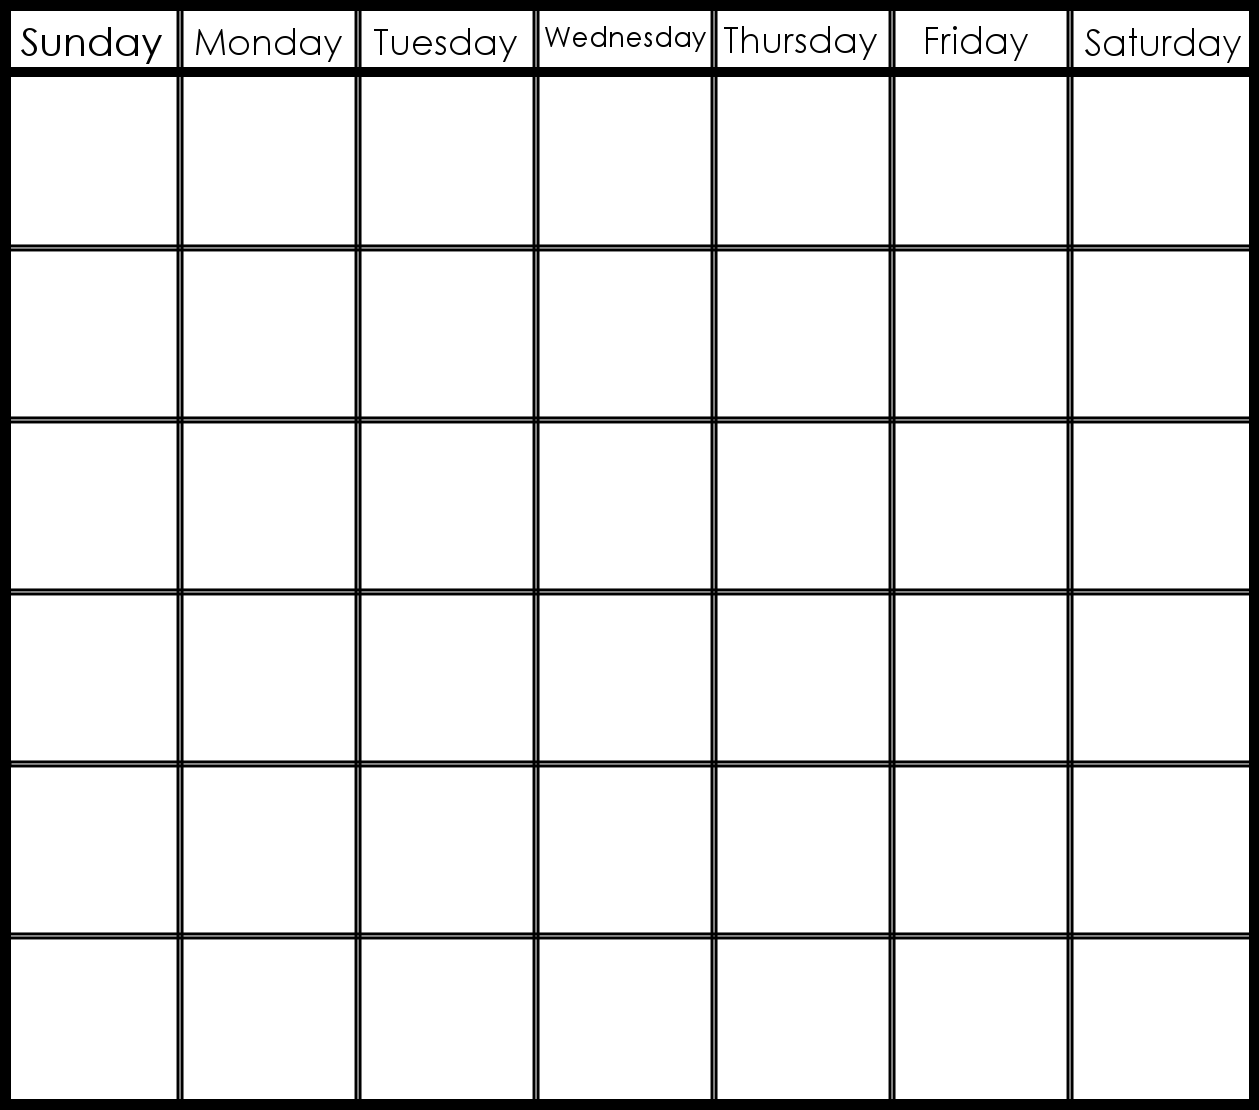 calendar template by glomdi on deviantart